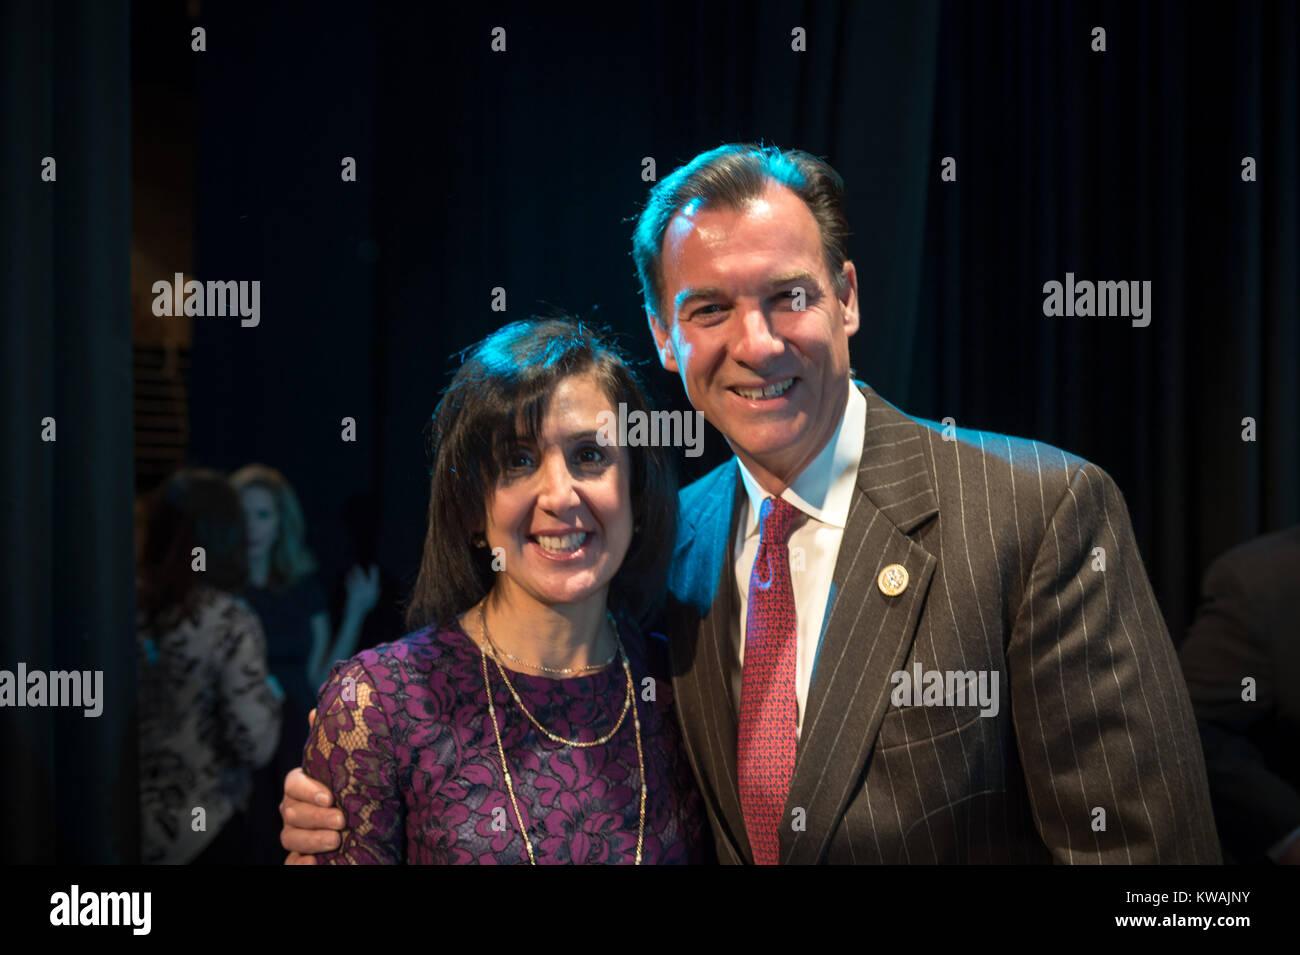 Hempstead, New York, USA. 1st Jan, 2018. Hempstead, New York, USA. January 1, 2018. L-R, SYLVIA CABANA and New York Stock Photo